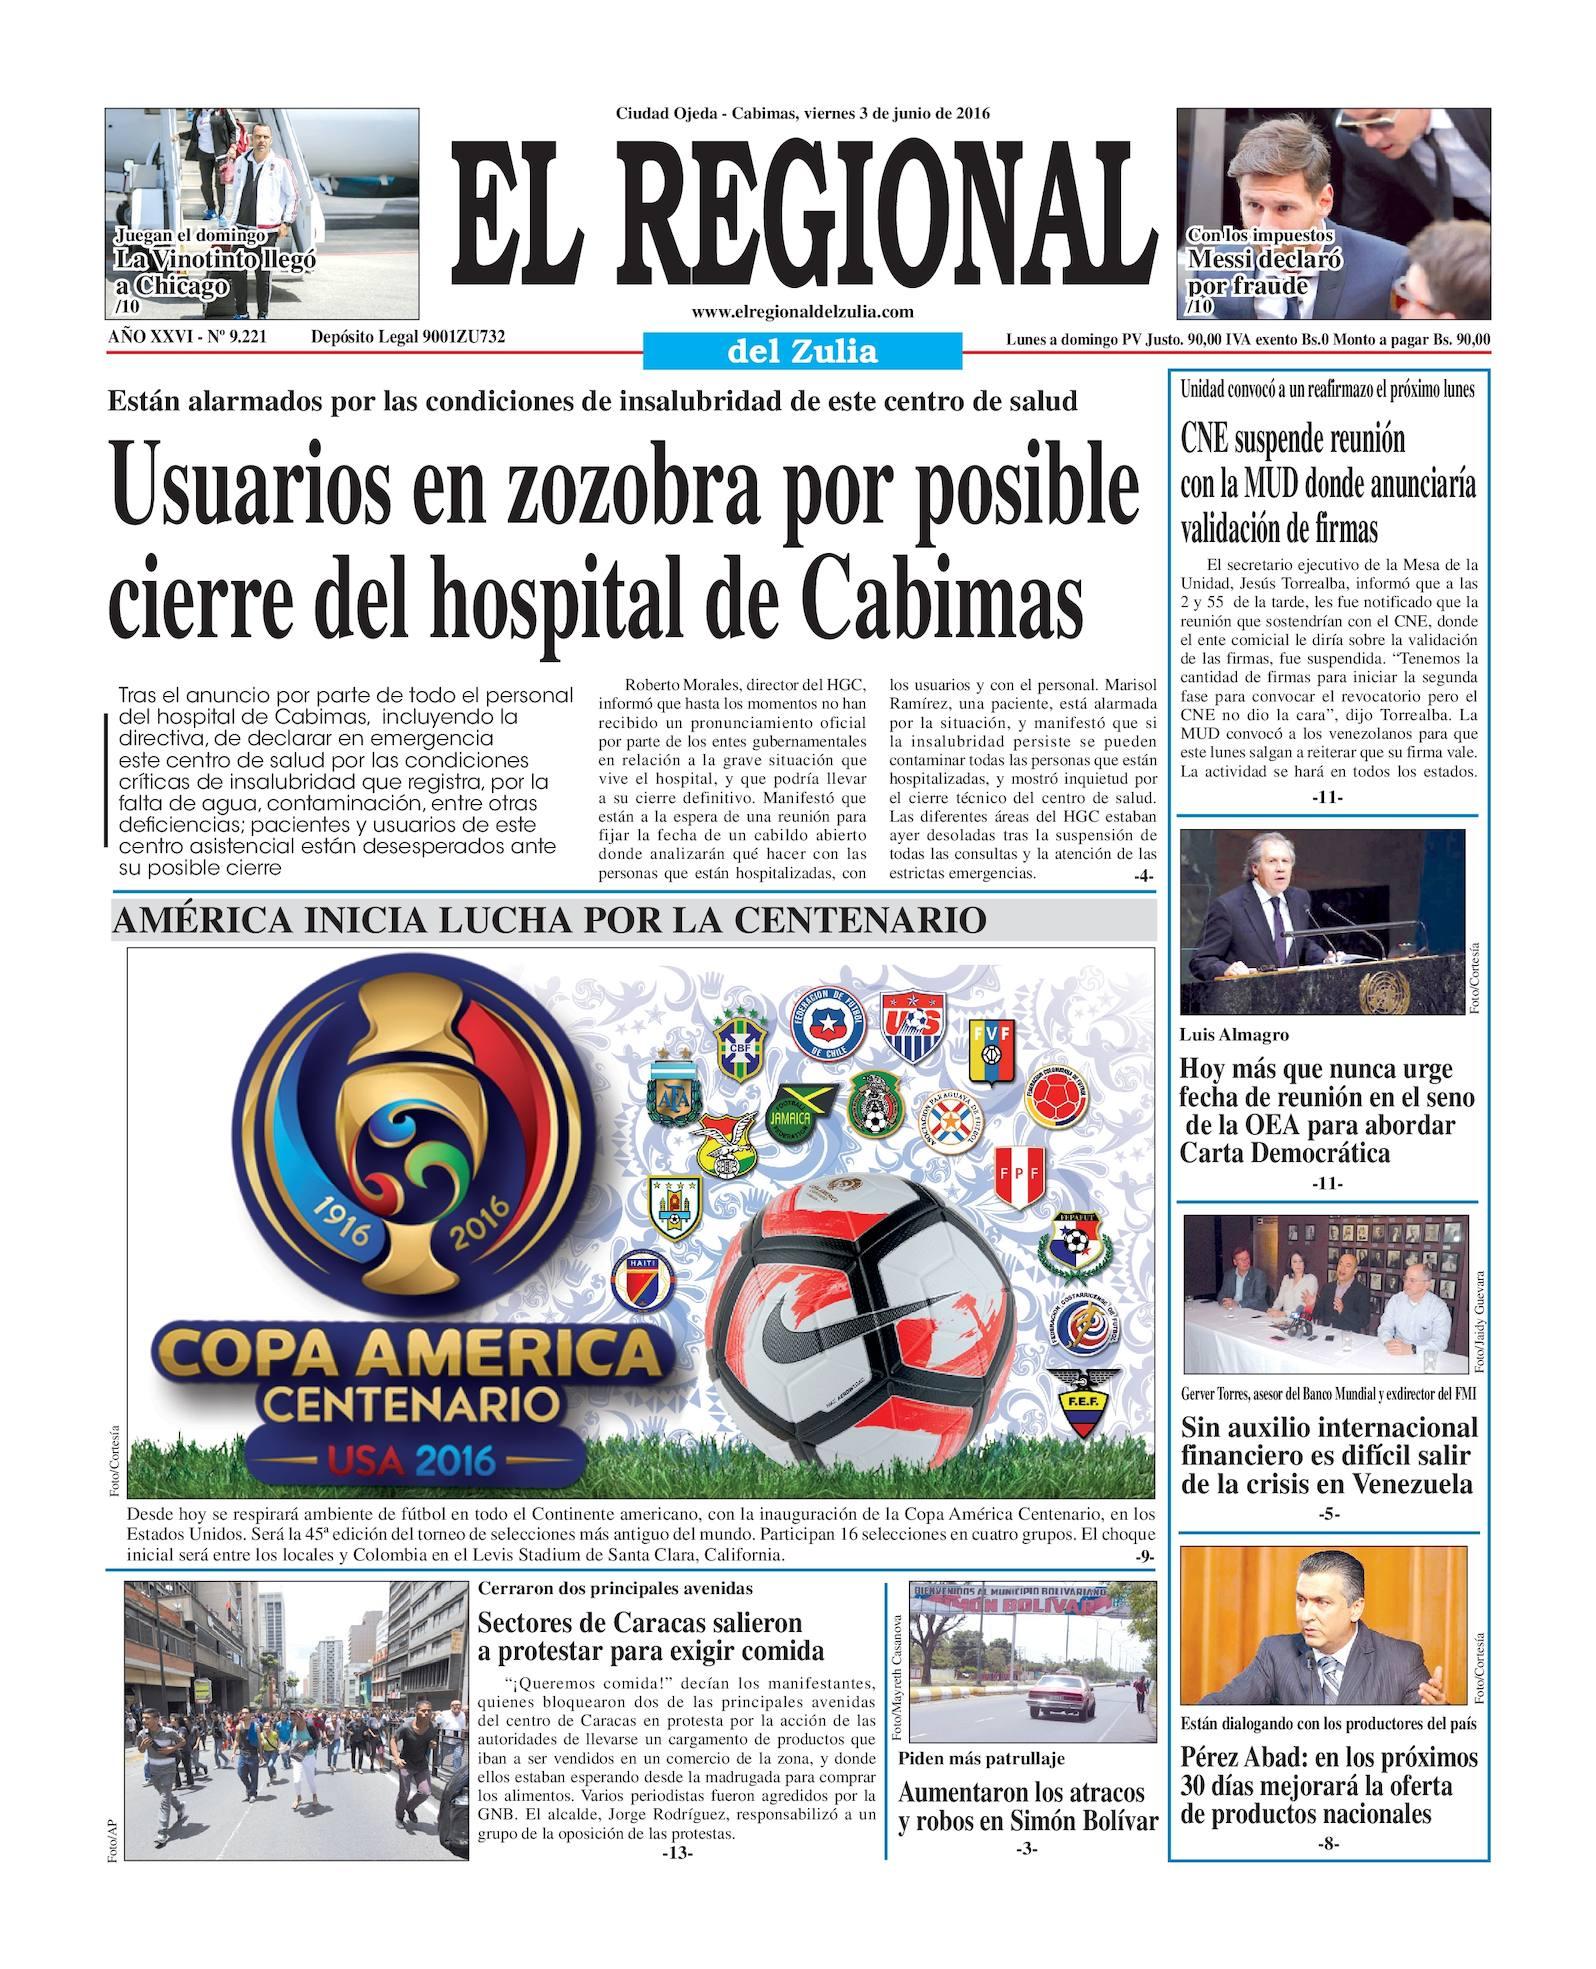 Calaméo - El Regional del Zulia 03-06-2016